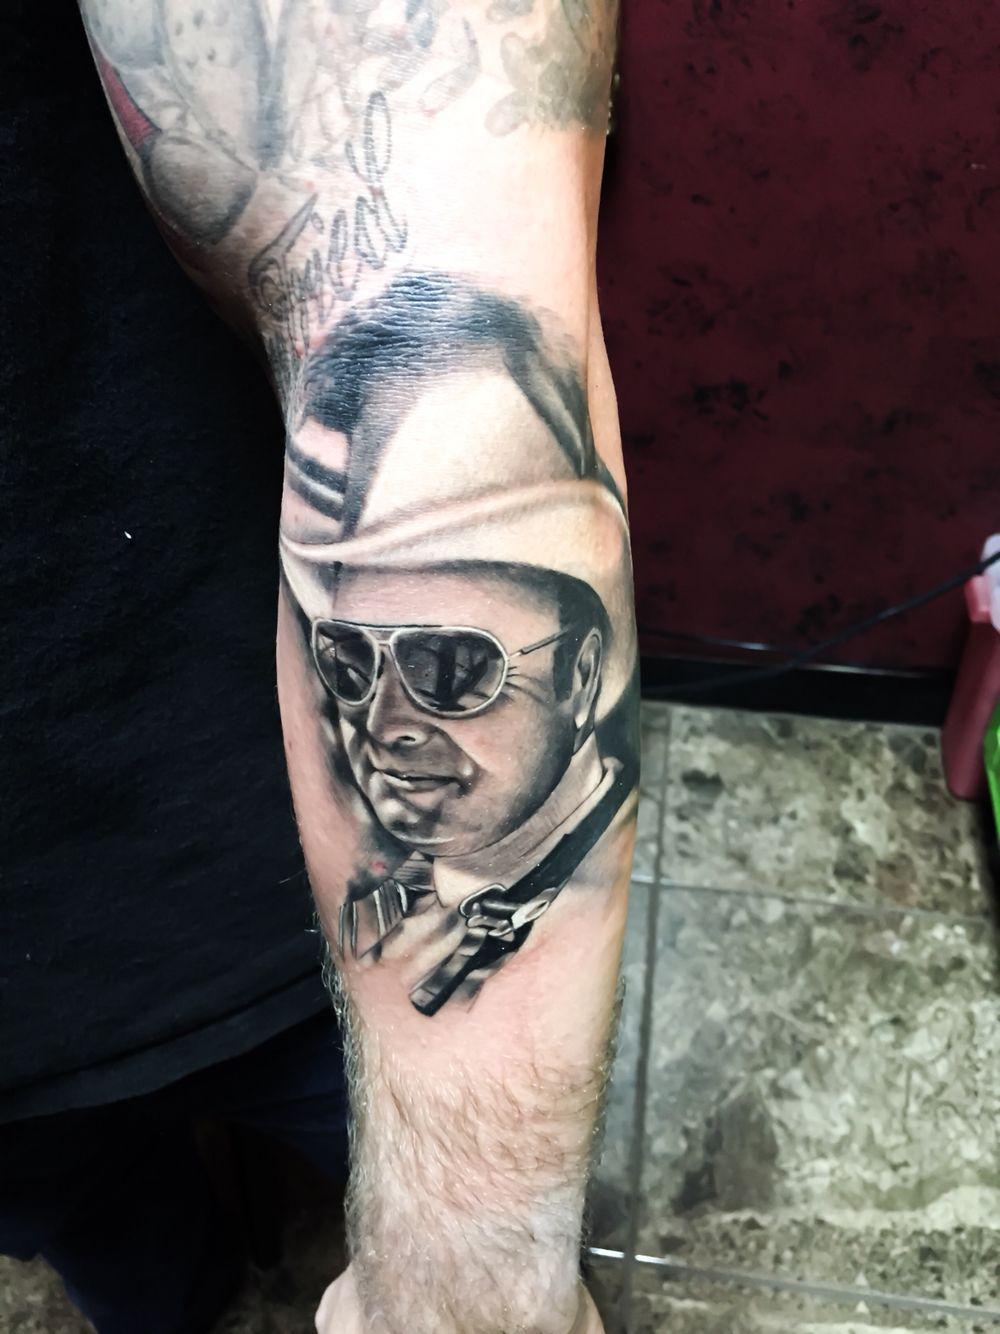 Watercolor tattoo artists in houston texas - Portrait Tattoo By Elijah Nguyen At Skin Stories Tattoo In Houston Tx Add Me On Instagram